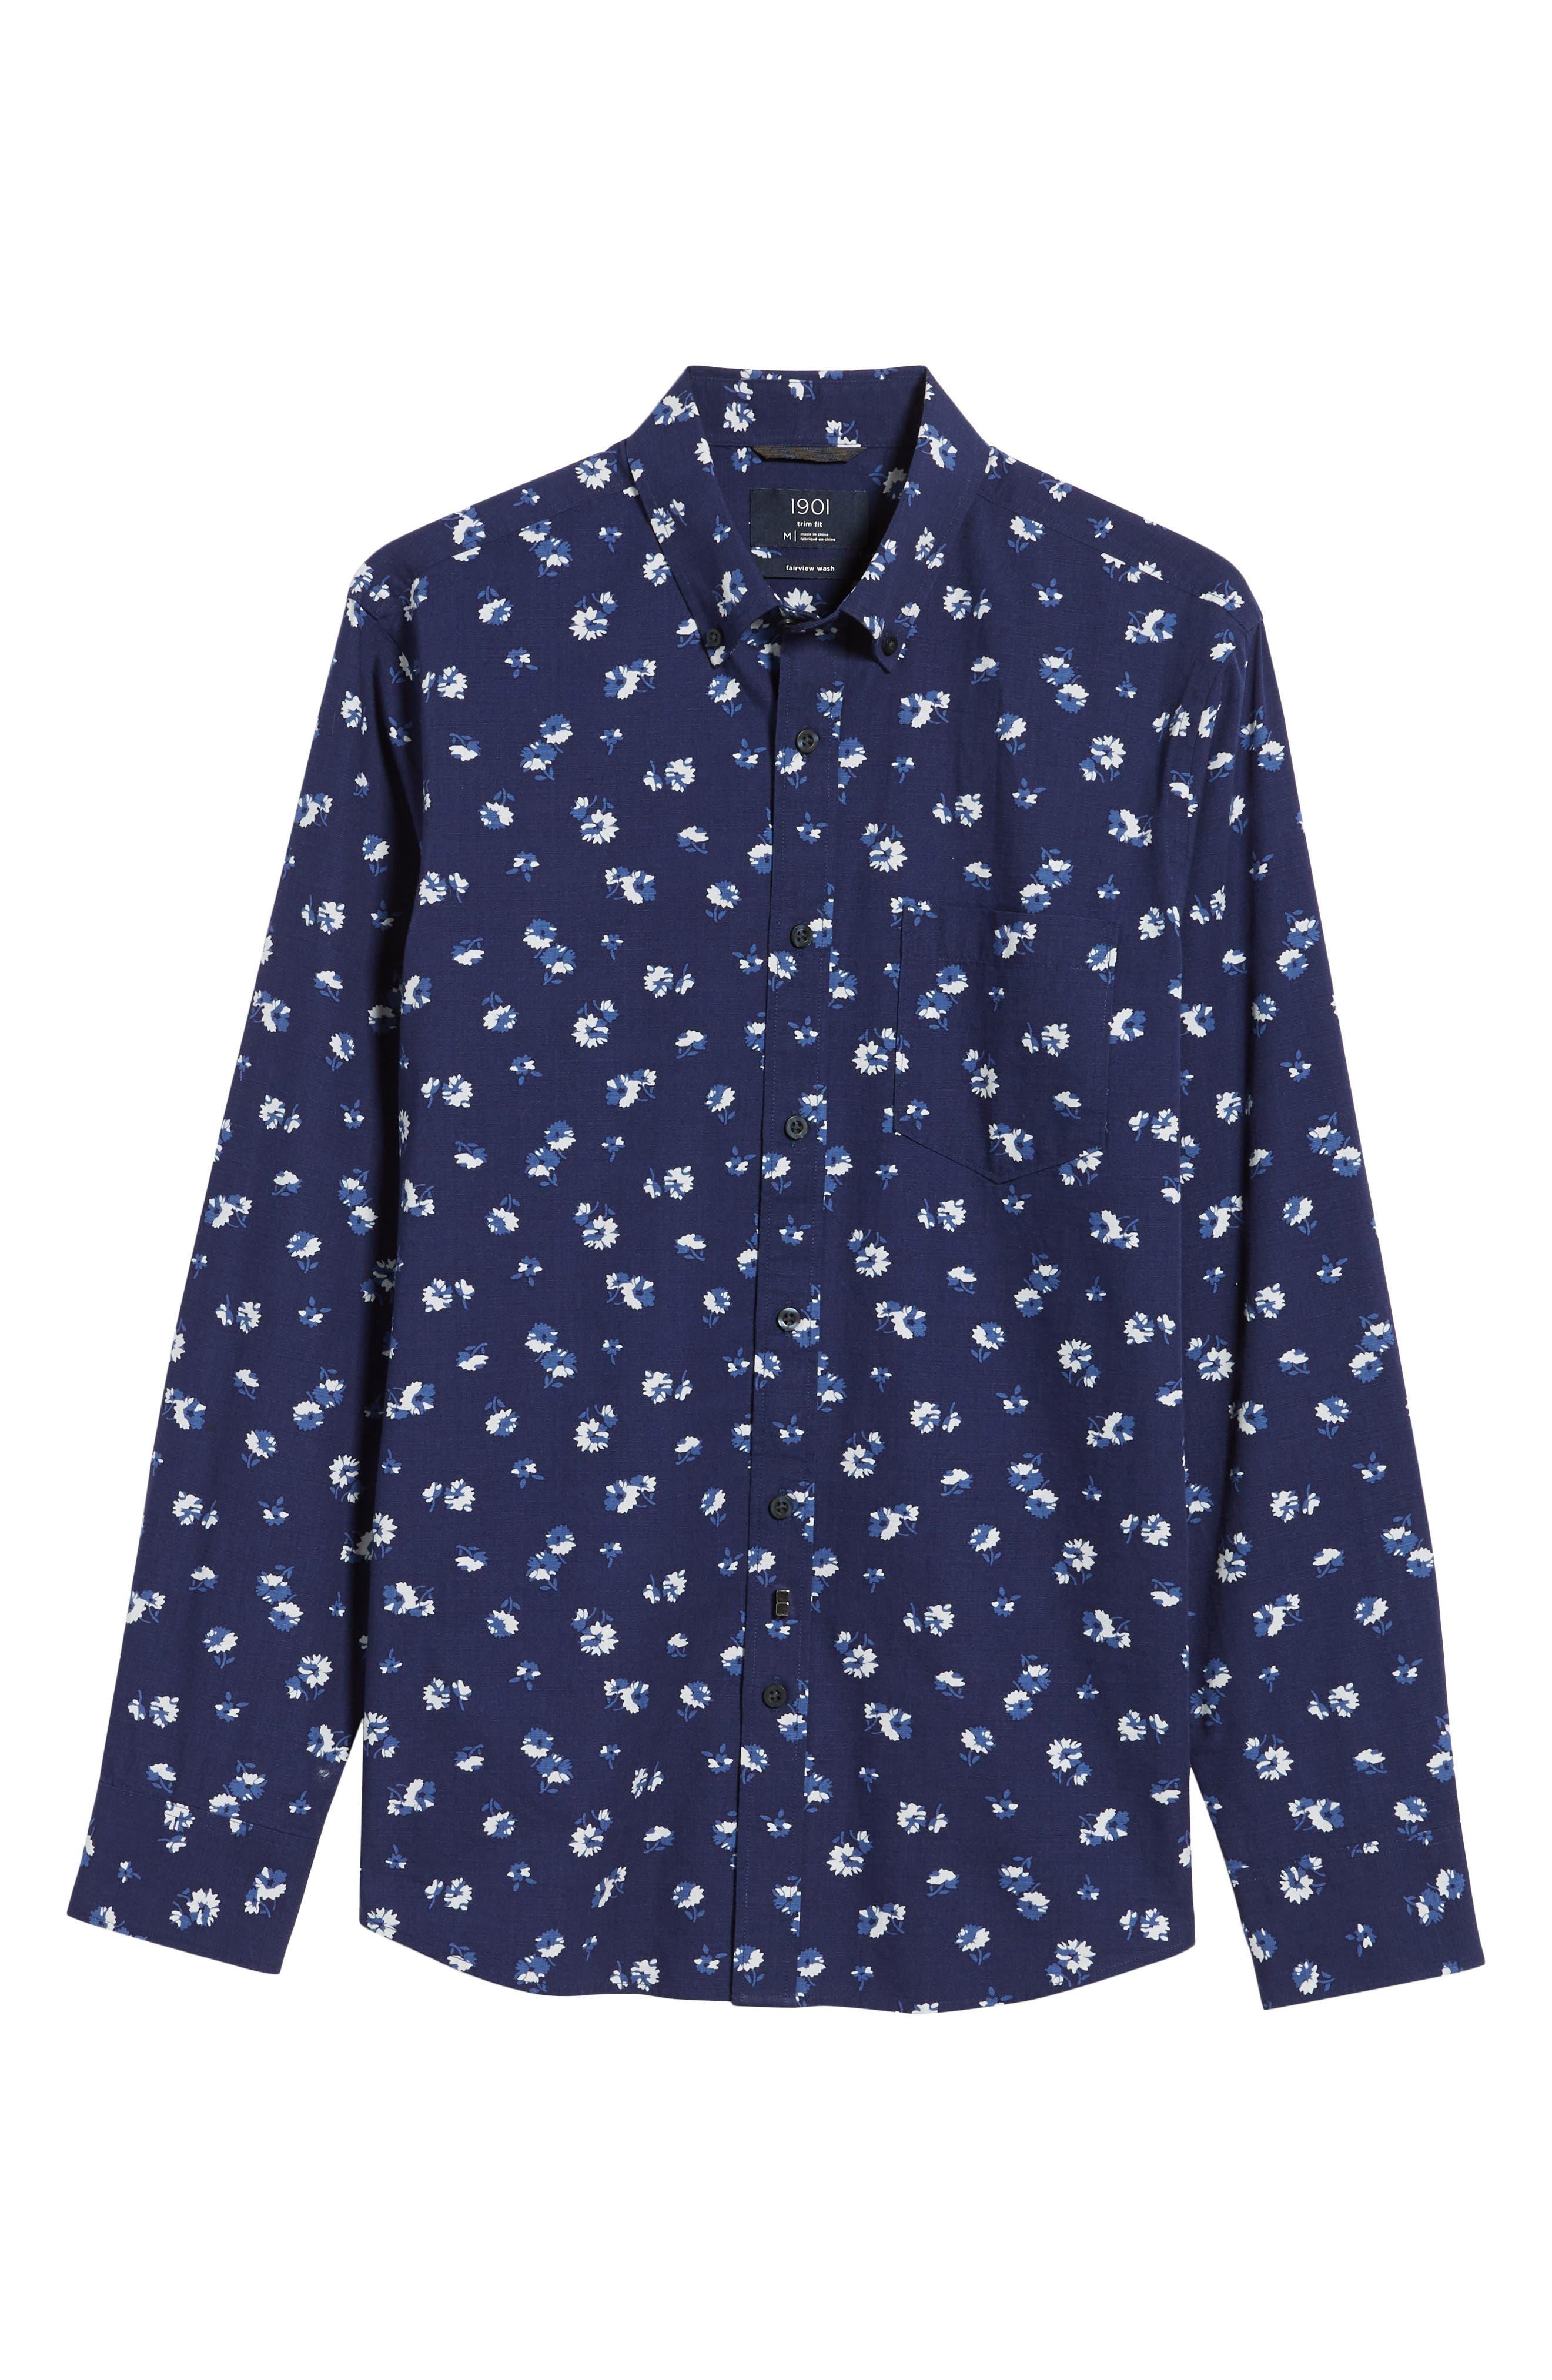 Trim Fit Floral Sport Shirt,                             Alternate thumbnail 8, color,                             Navy Iris Aster Flowers